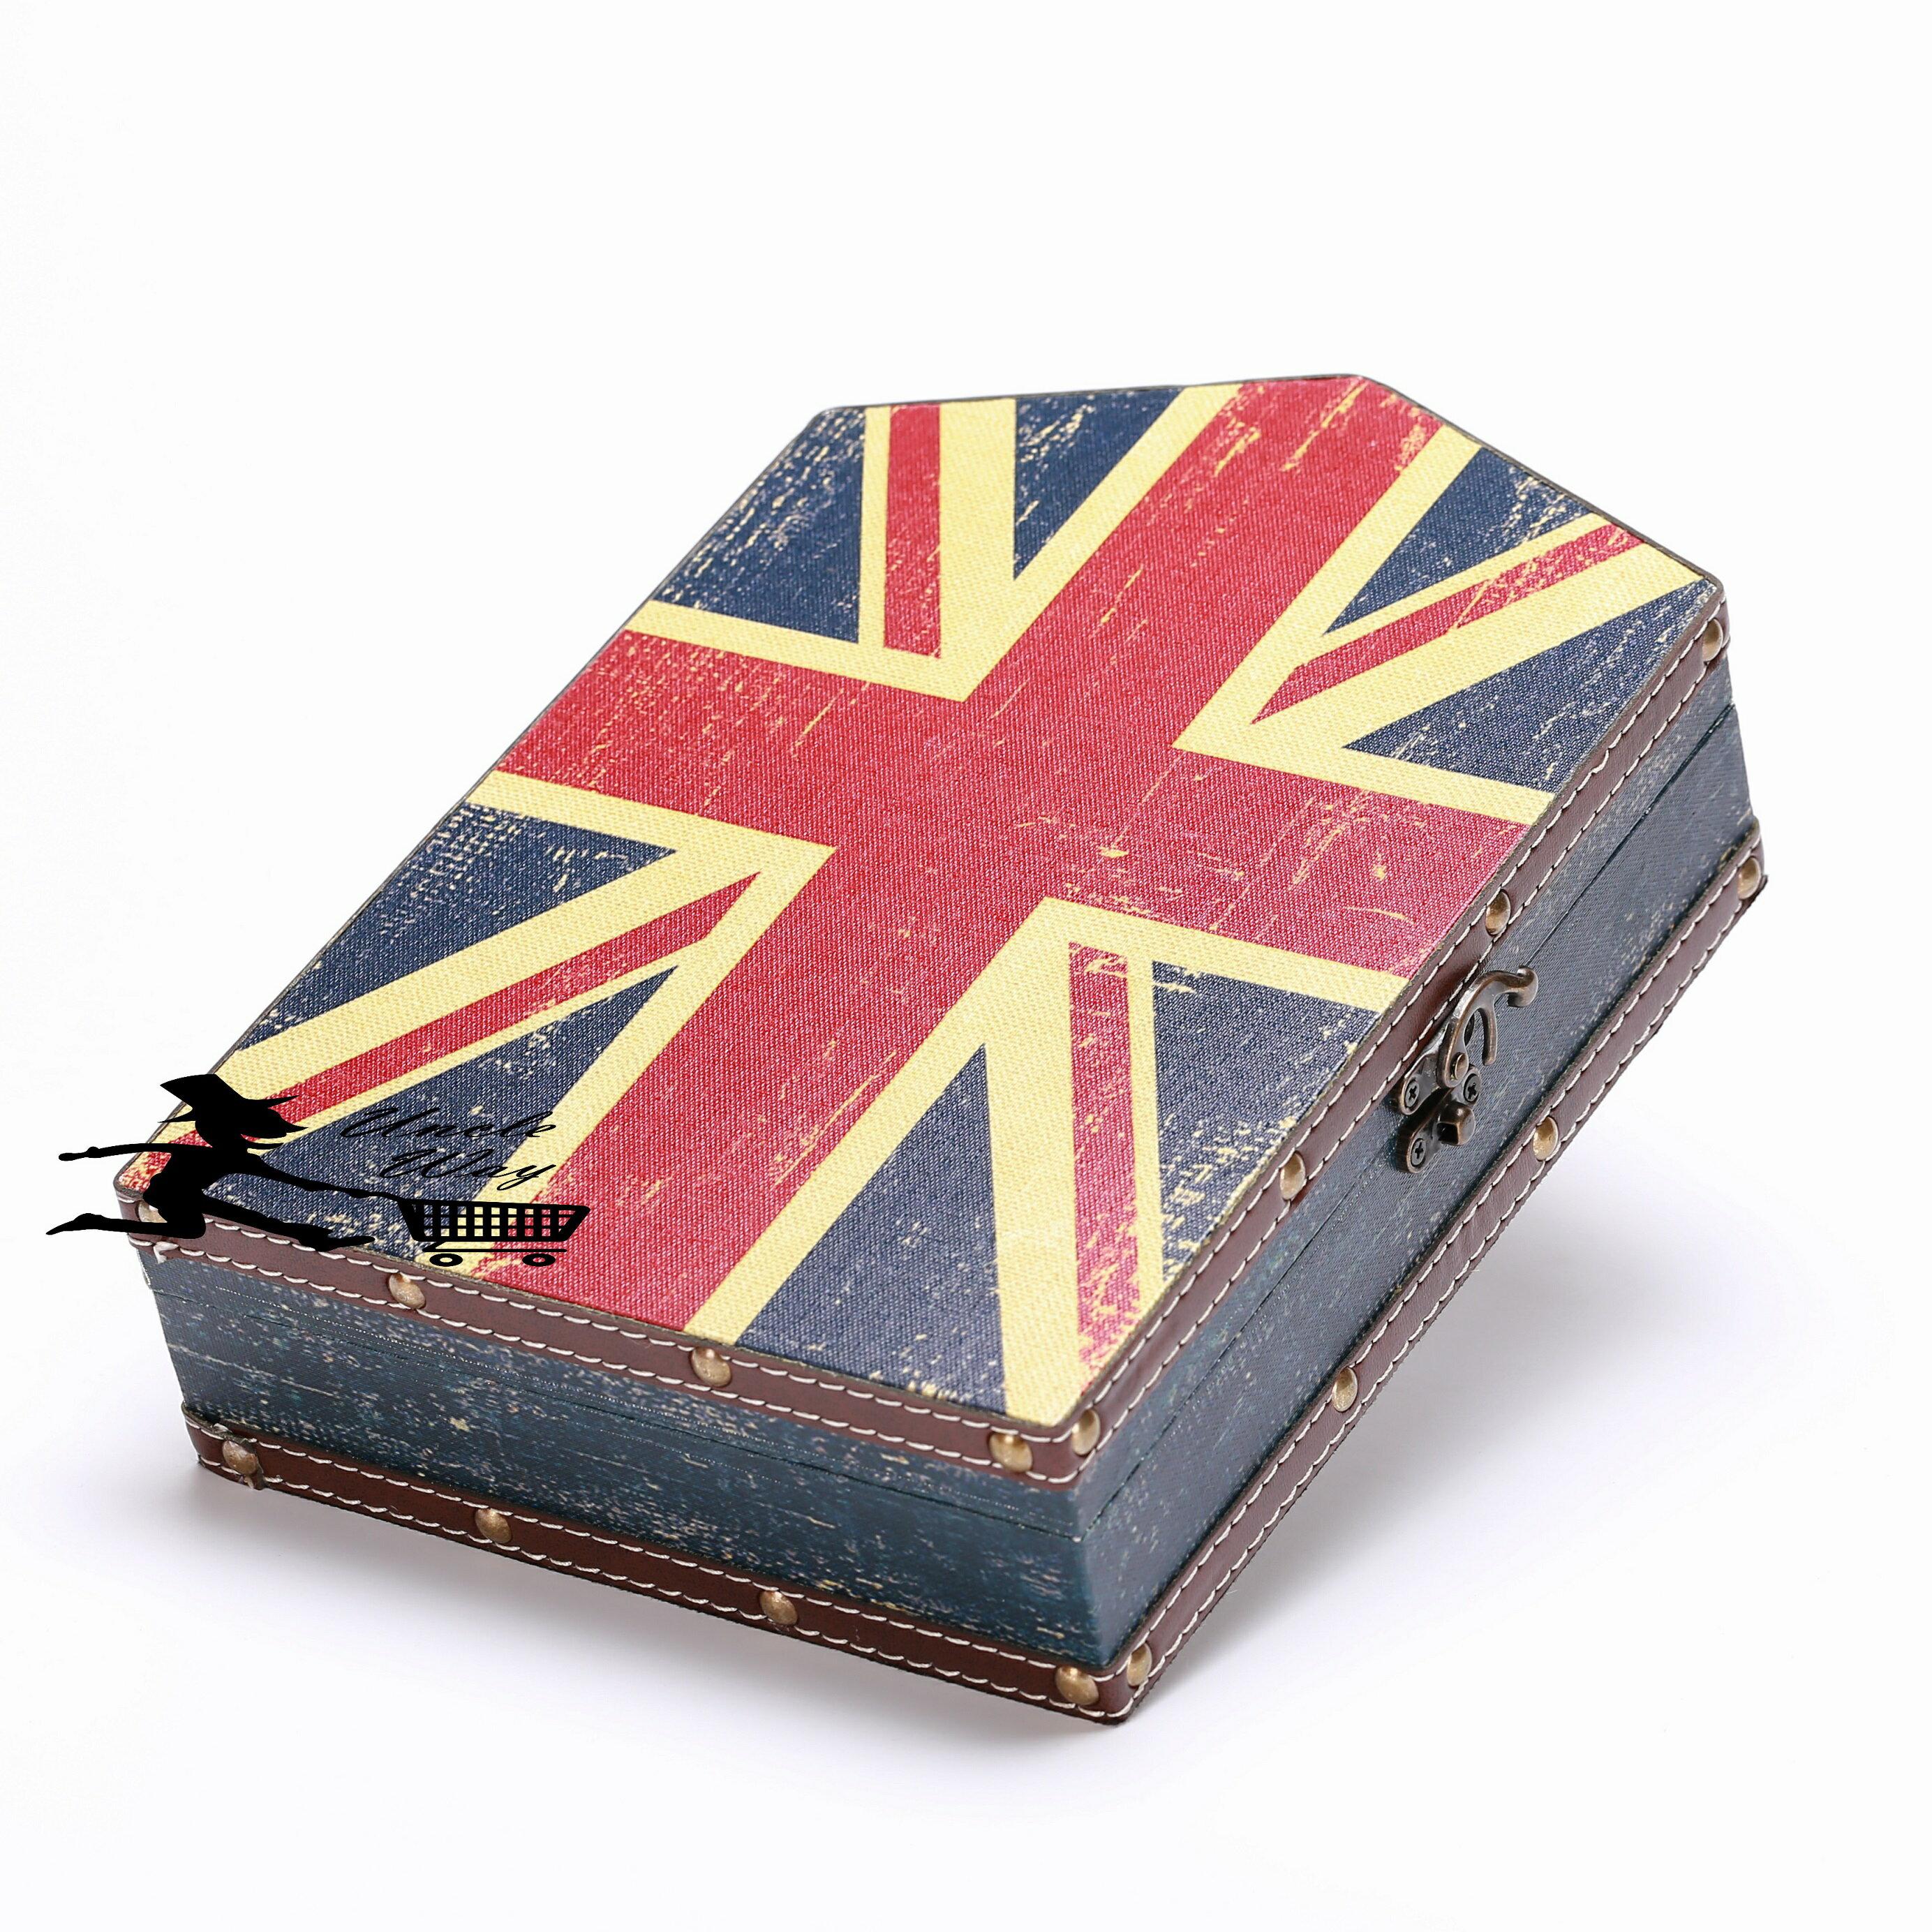 [Uncle way 百貨城堡] 英倫風木質鑰匙盒 英國旗 雜物鑰匙箱 遮擋箱 居家裝飾 ZAKKA 壁掛 居家裝飾